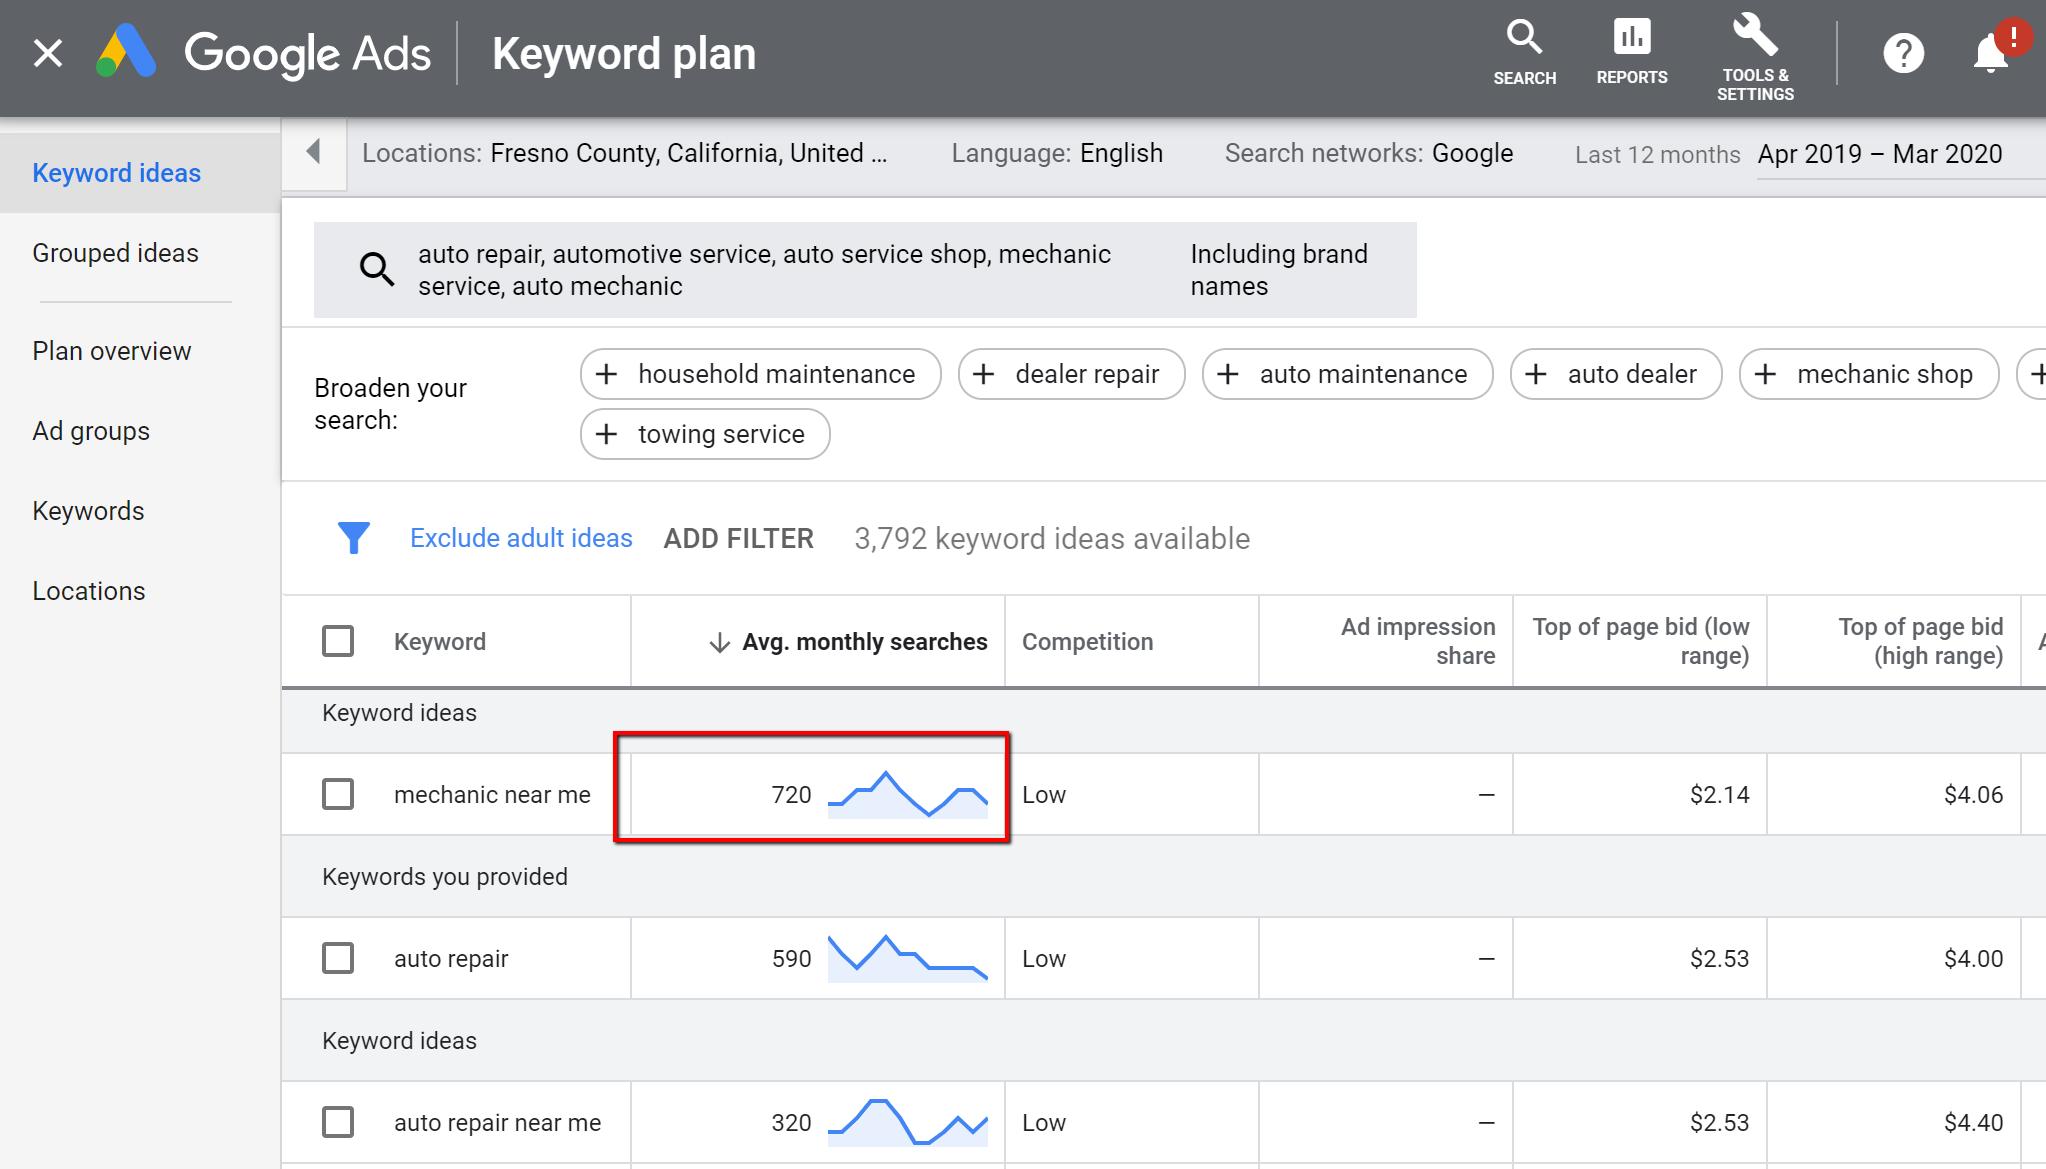 Google Keyword monthly search volume